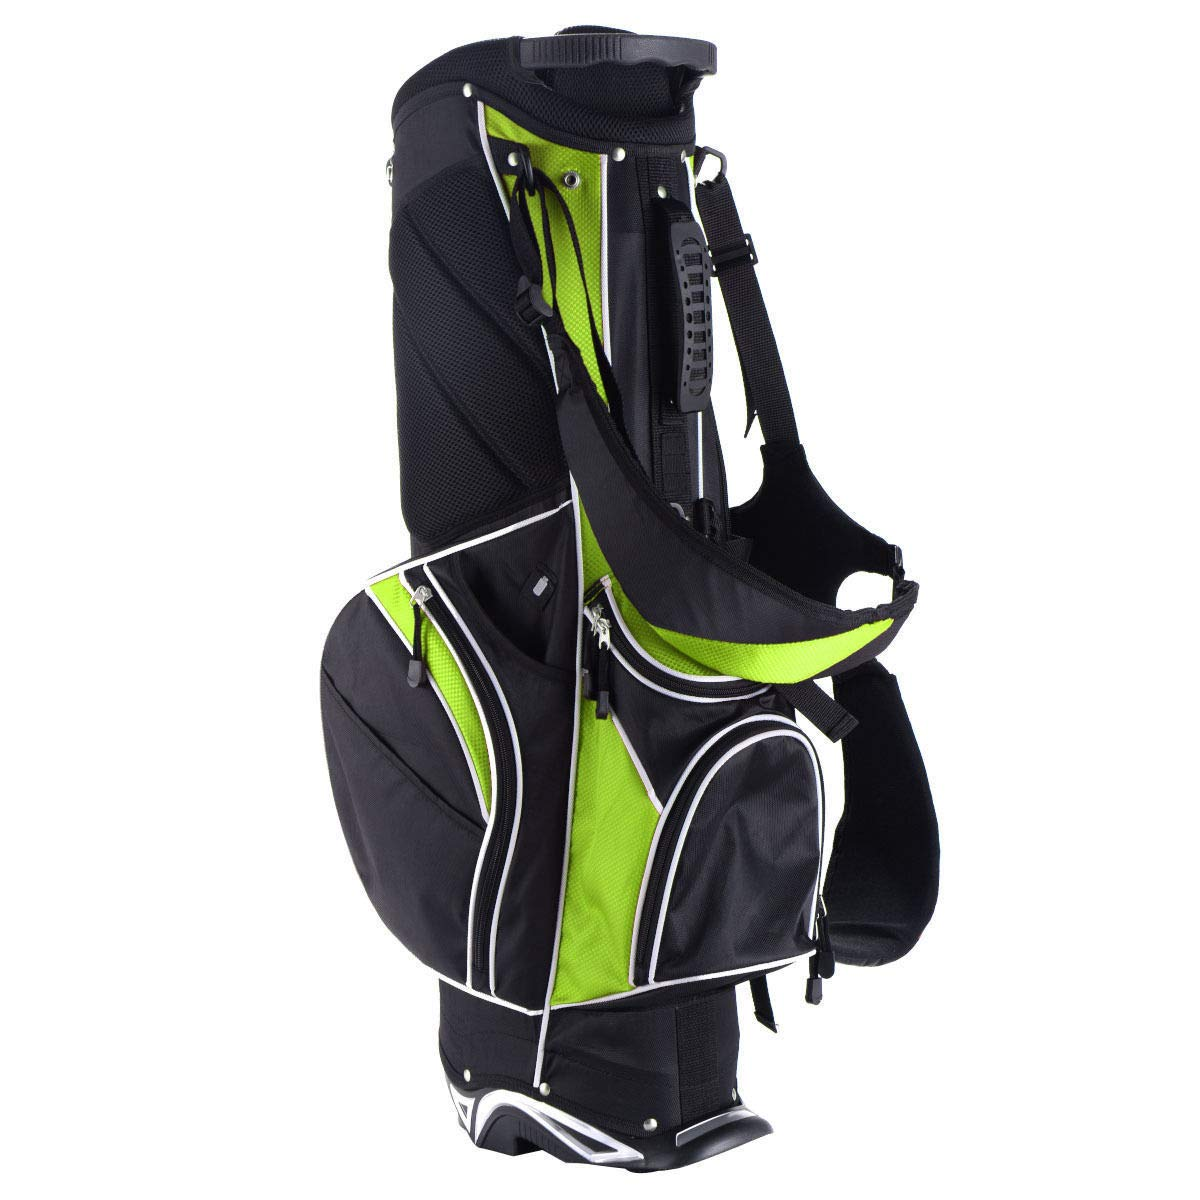 Globe House Products GHP グリーンポリエステル生地 アルミラバー&PPプラスチック 6分割 ゴルフスタンドバッグ